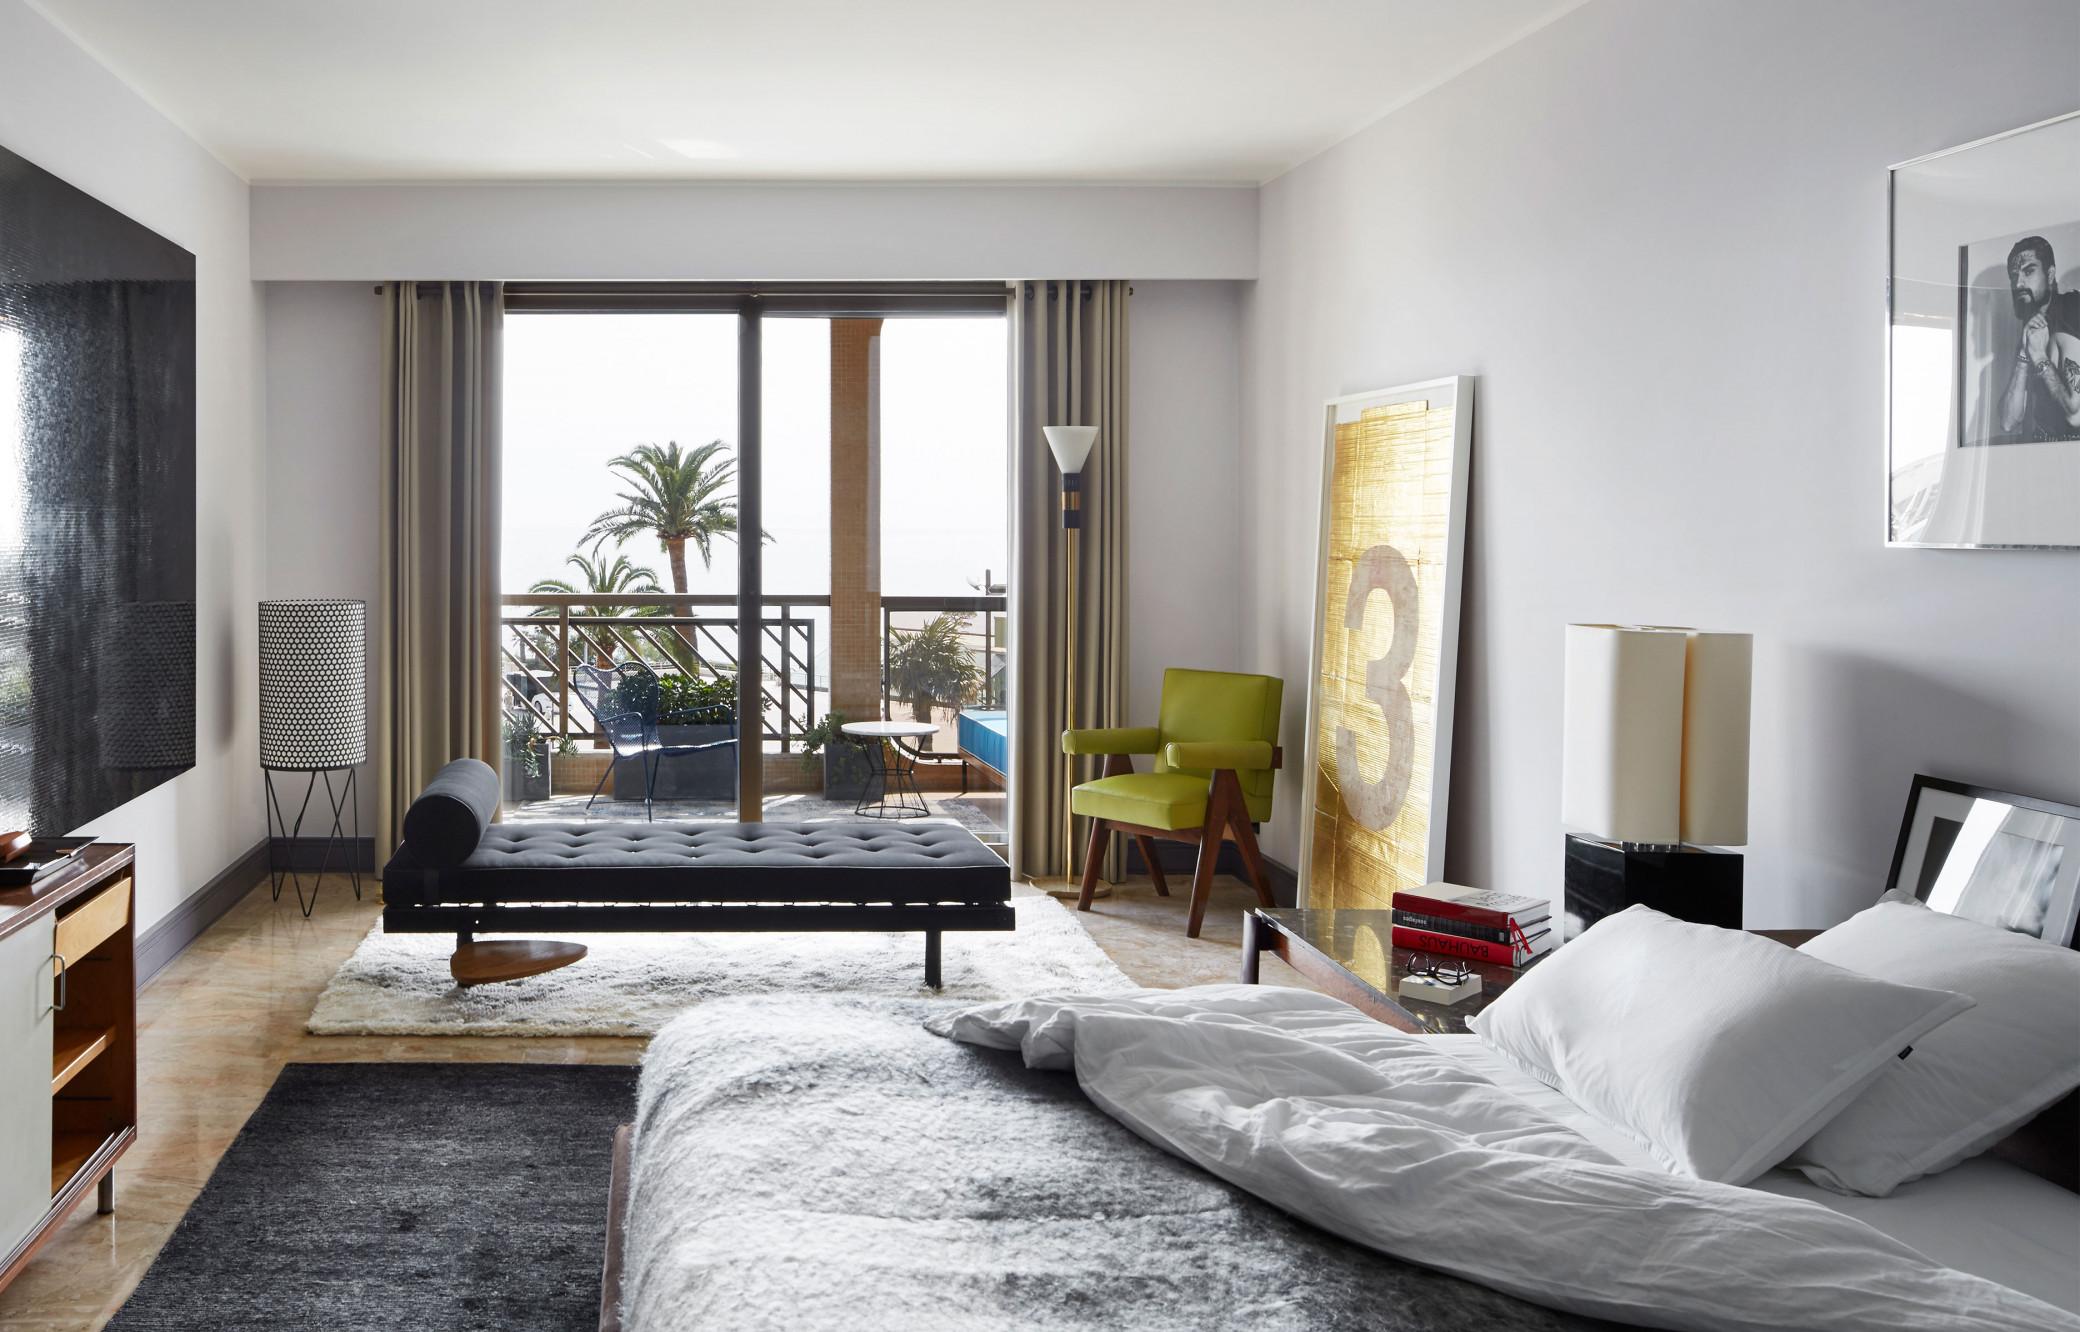 monaco l esprit riviera selon humbert poyet. Black Bedroom Furniture Sets. Home Design Ideas